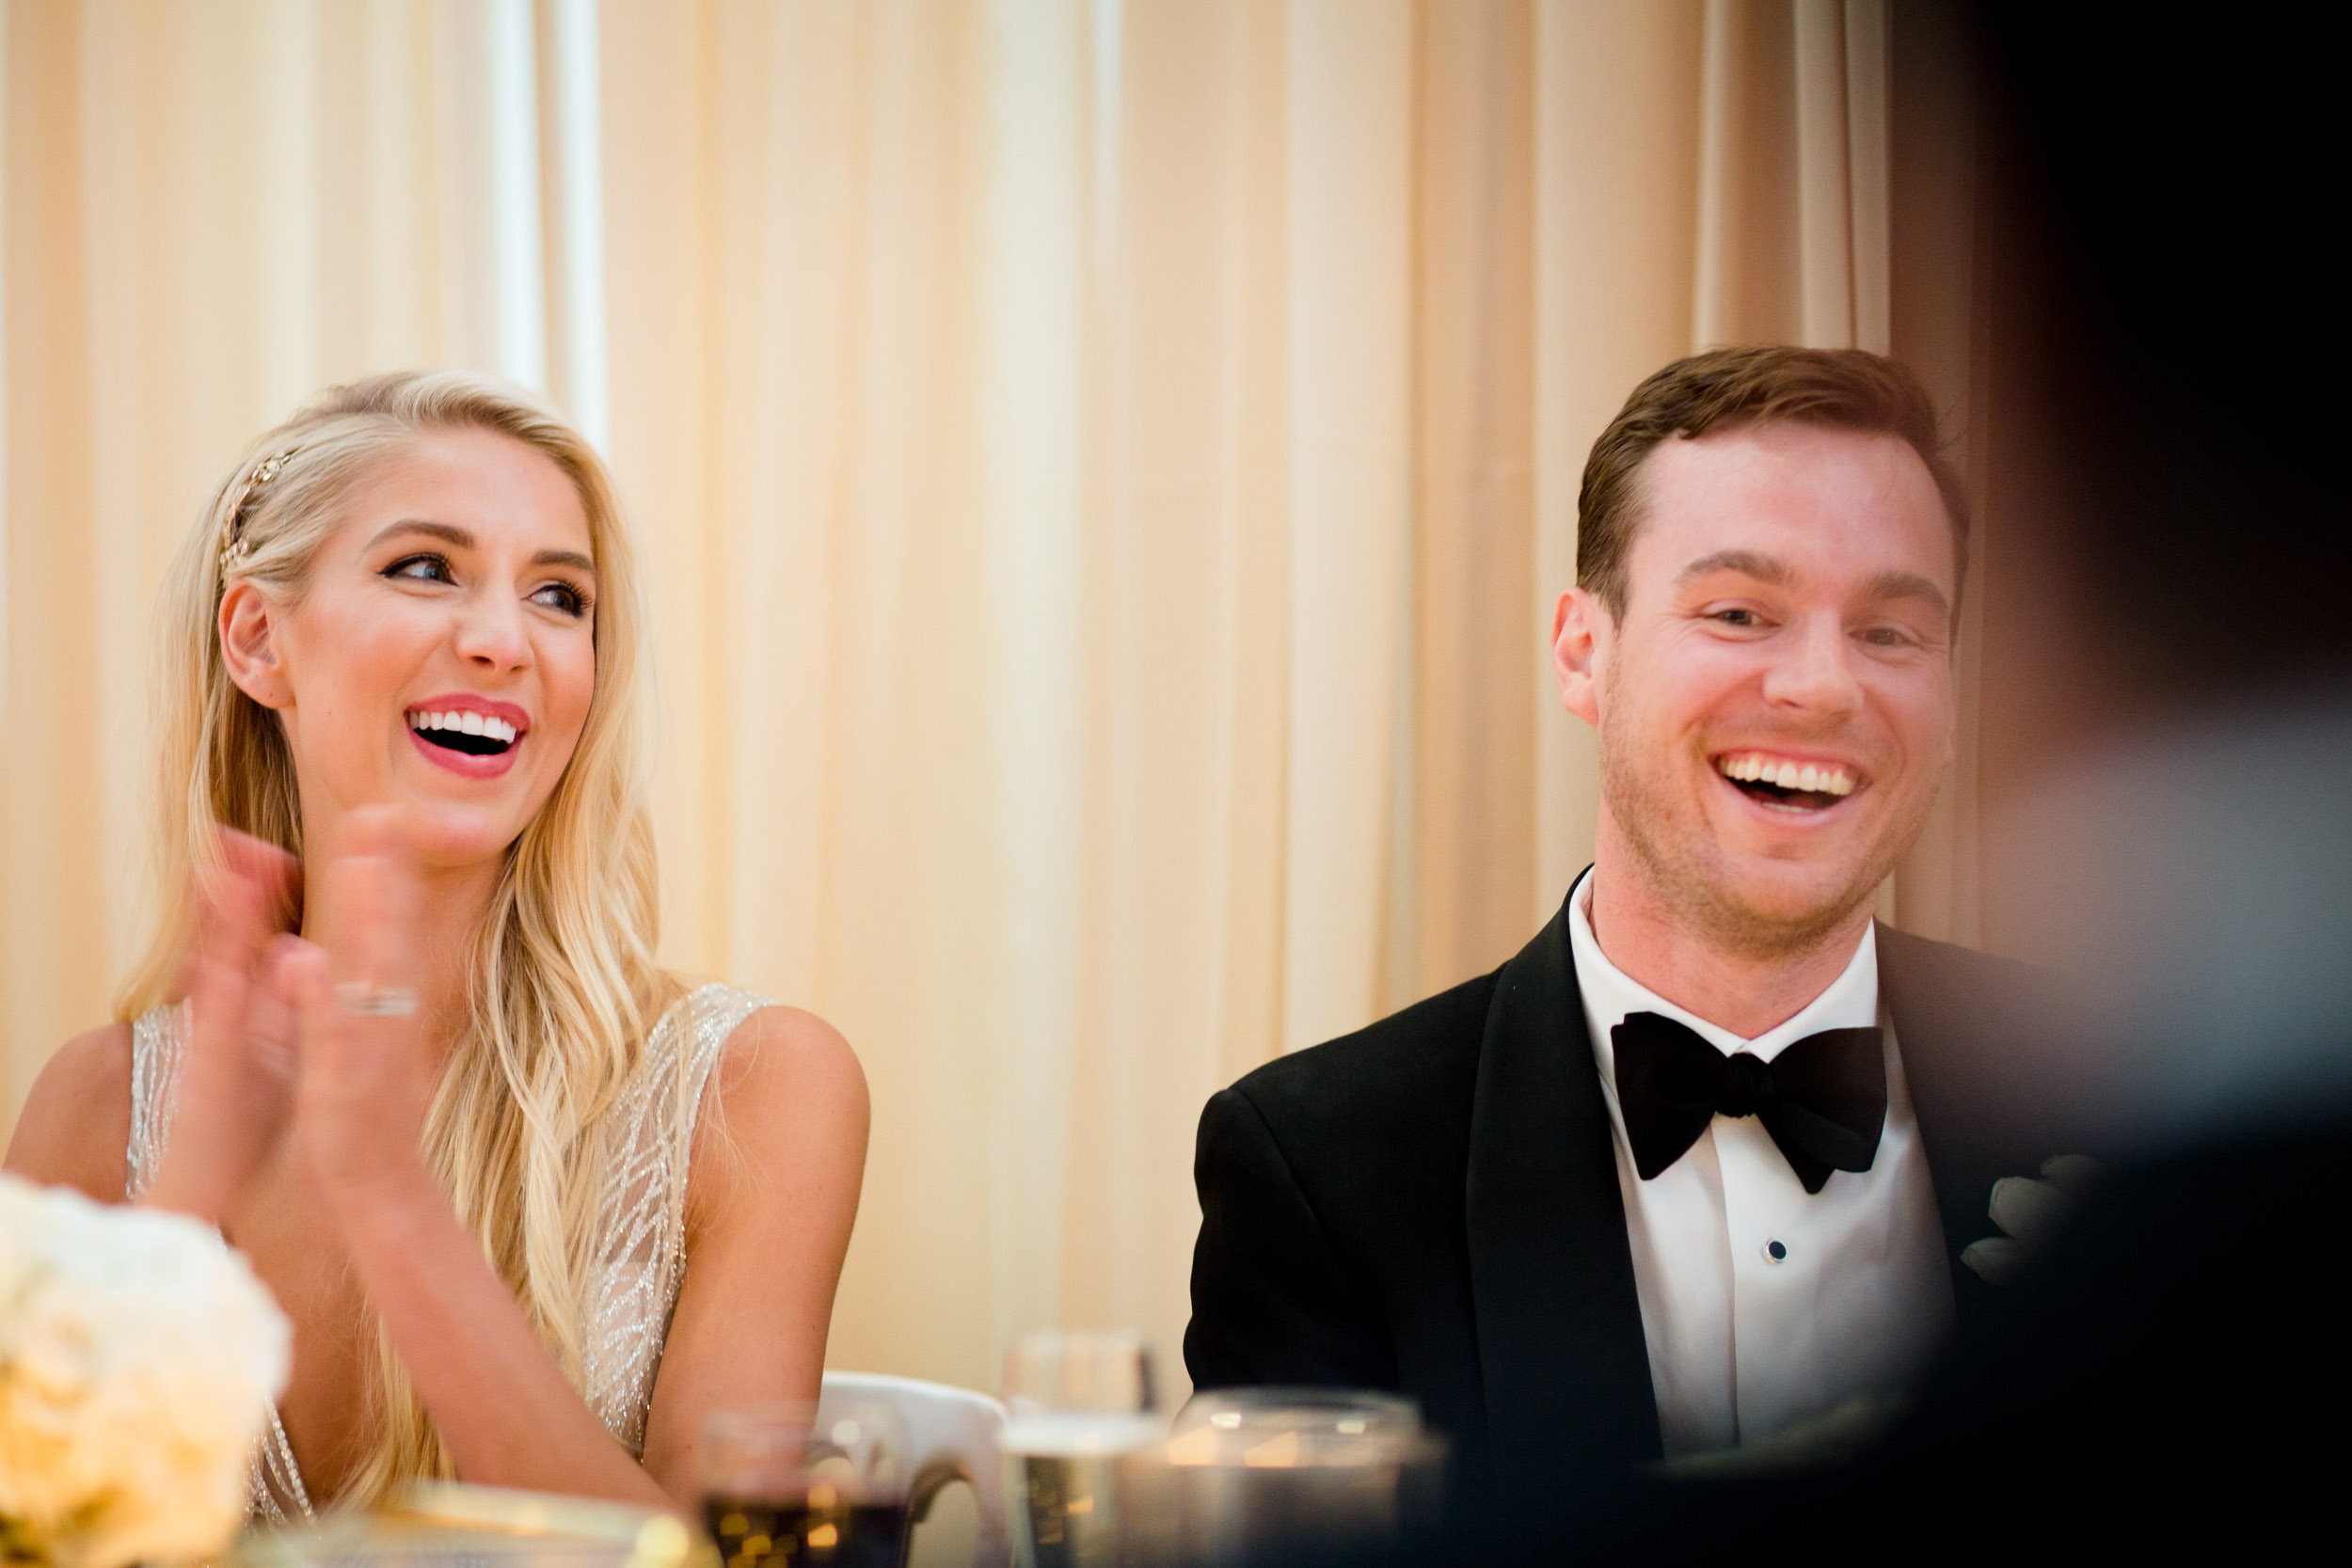 chicago-illuminating-co-wedding-photos-59.jpg